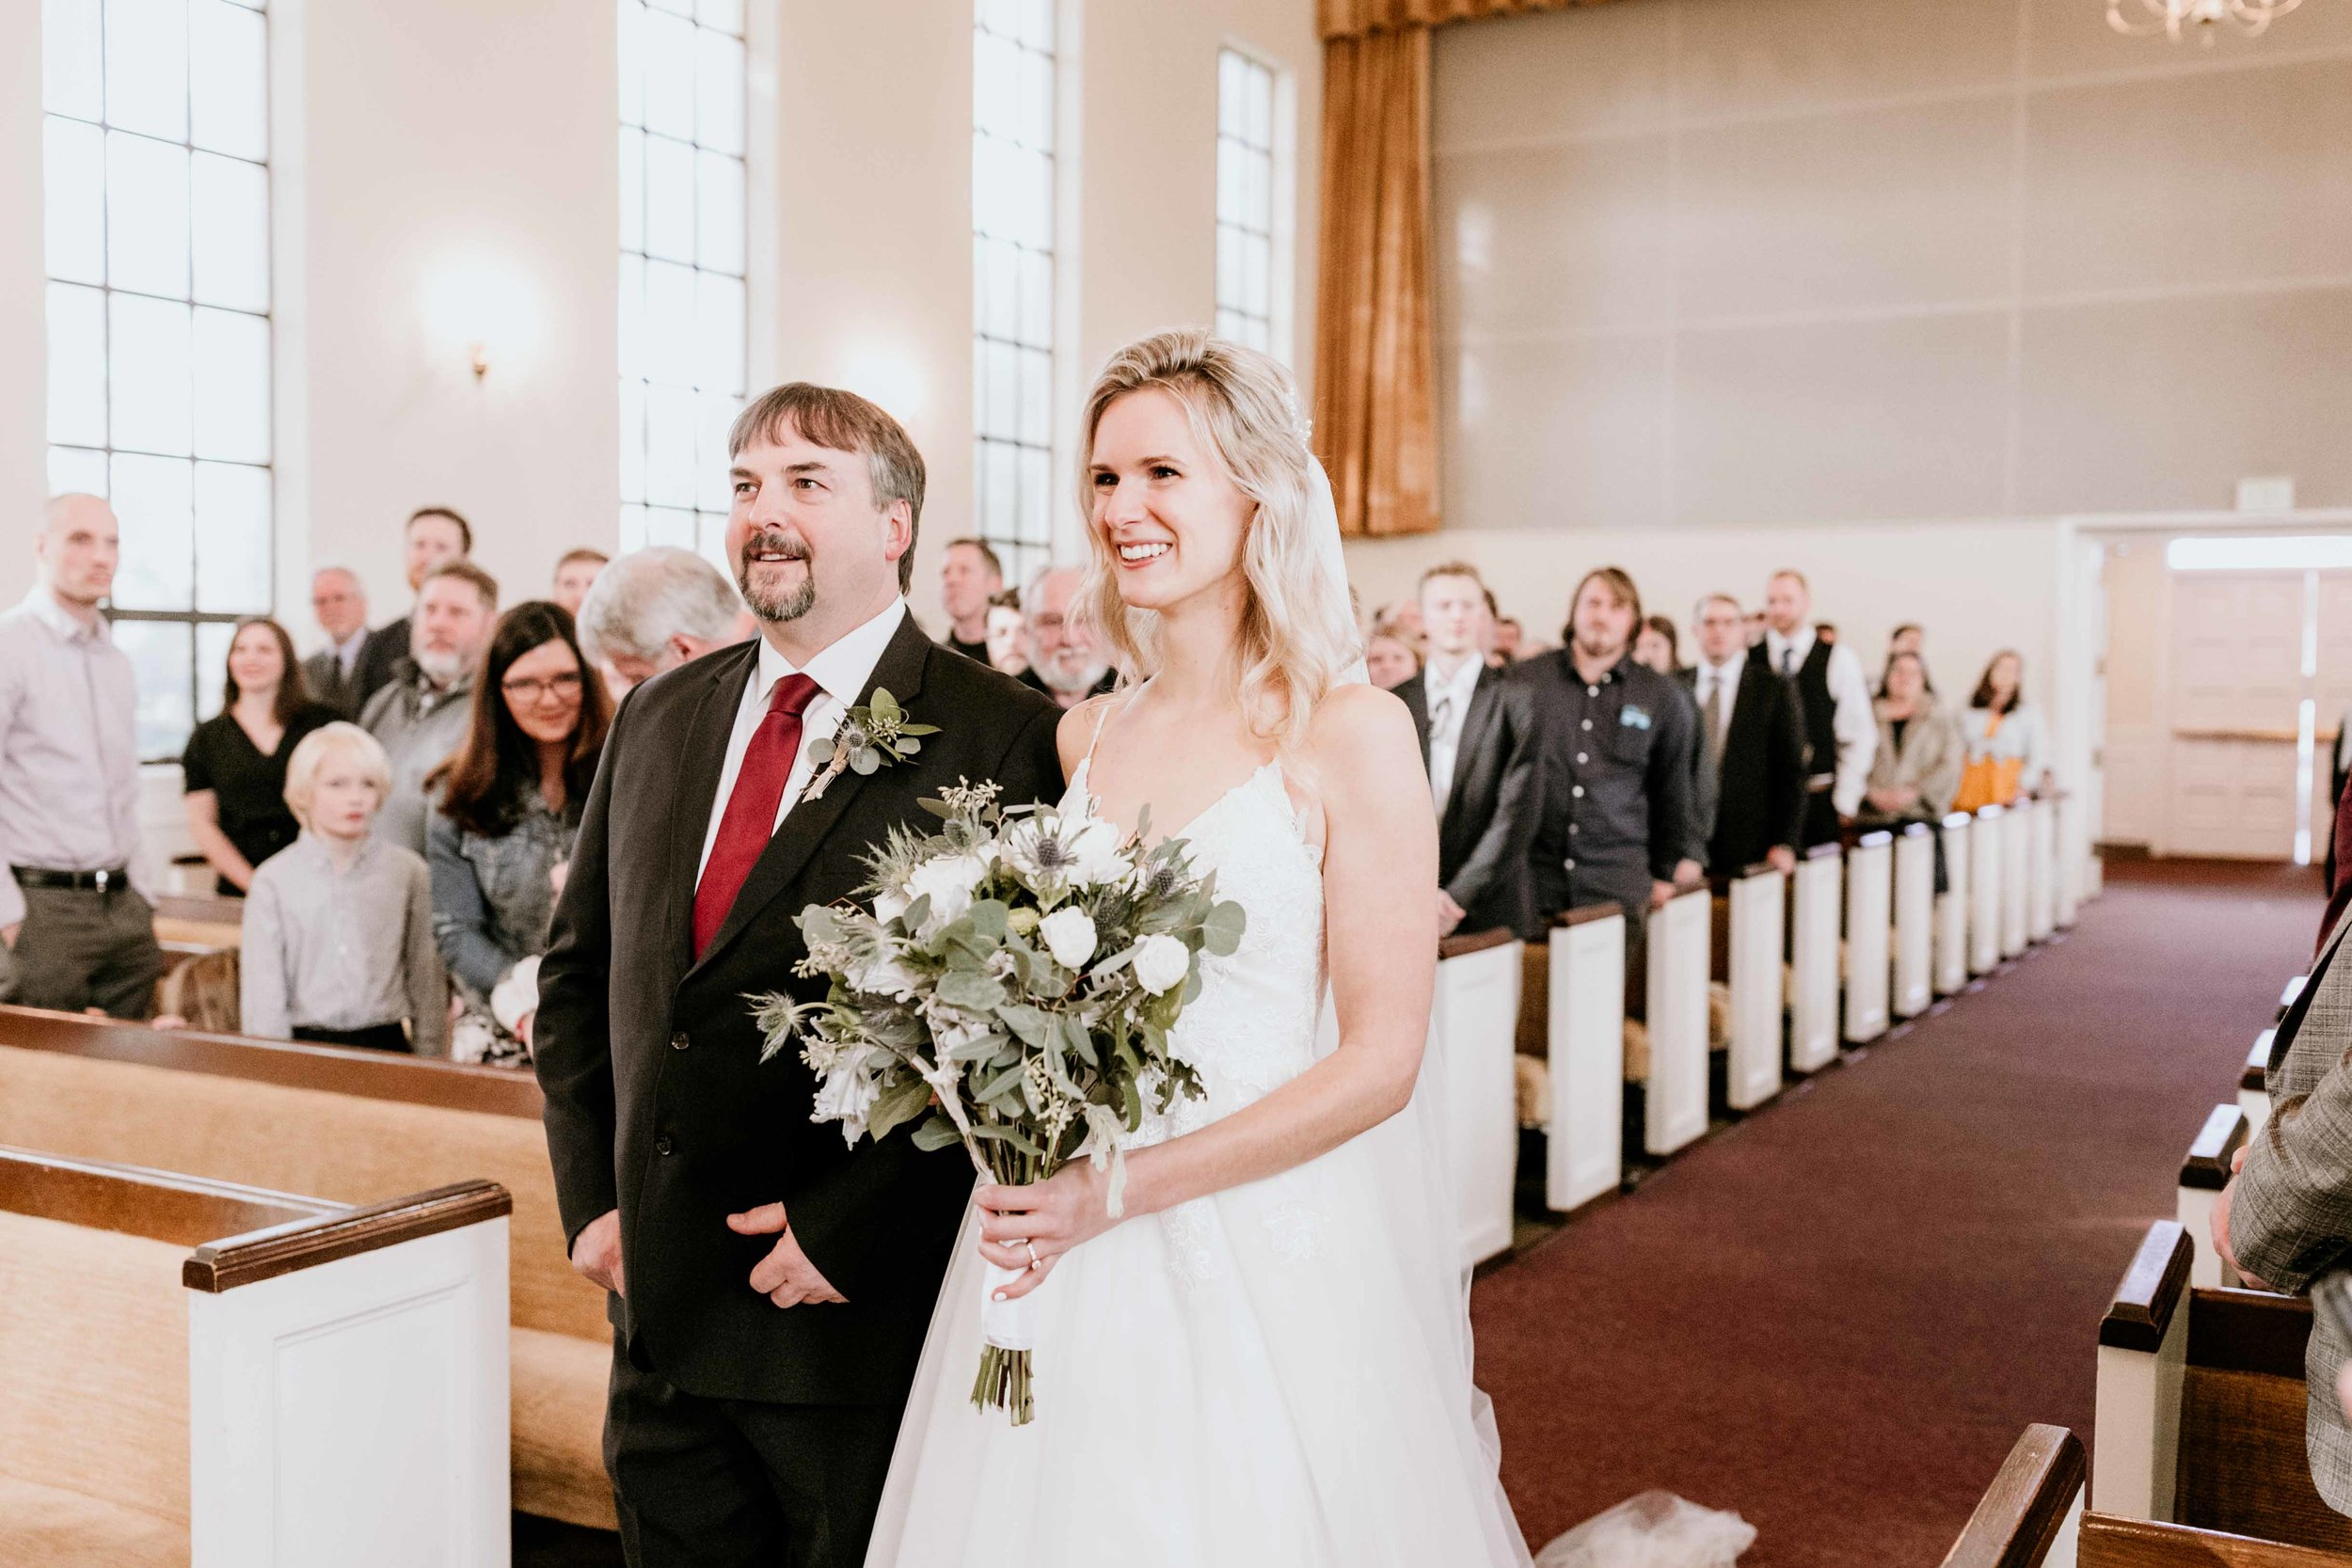 kilworth-memorial-chapel-wedding-62.jpg